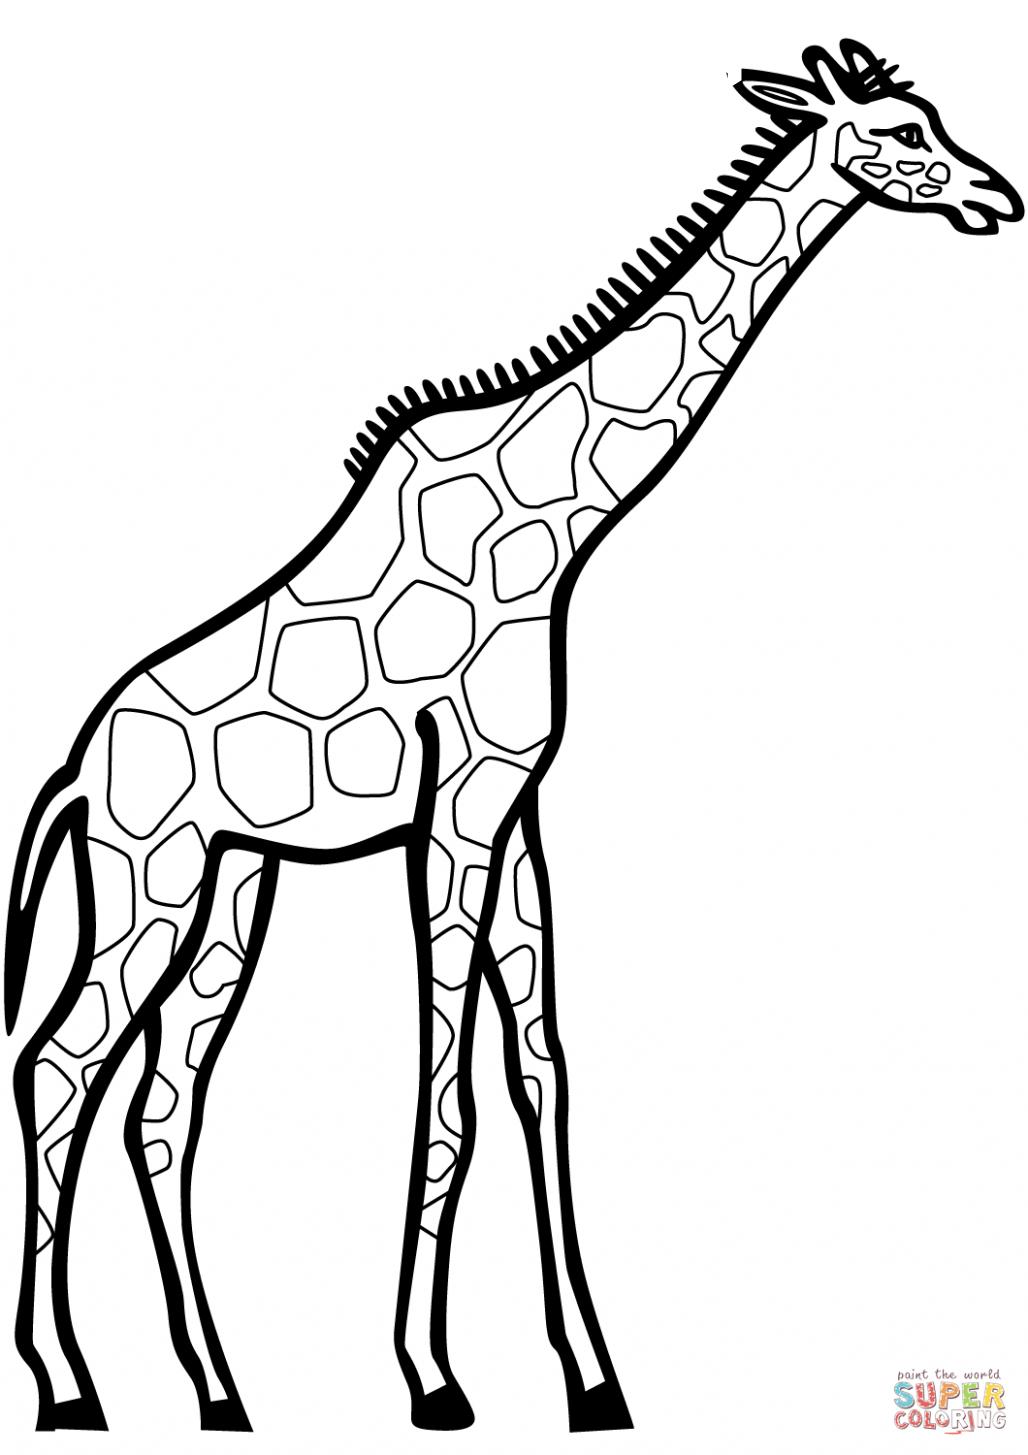 Giraffe To Color : giraffe, color, Giraffe, Color, Coloring, Pages,, Colors